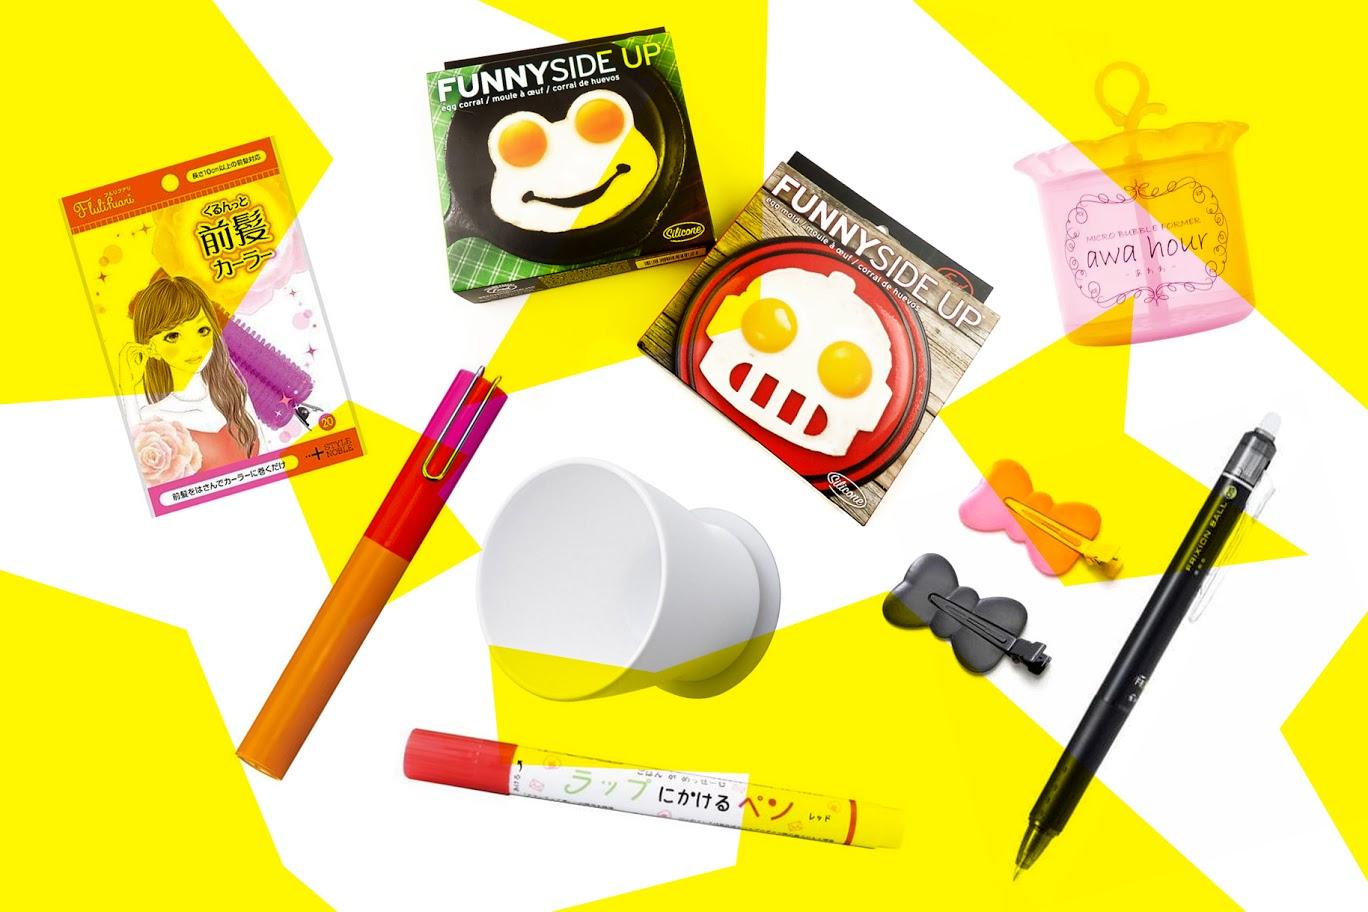 feea4441bdab7 8 Savvy Japanese Items To Improve Your Efficiency - Savvy Tokyo